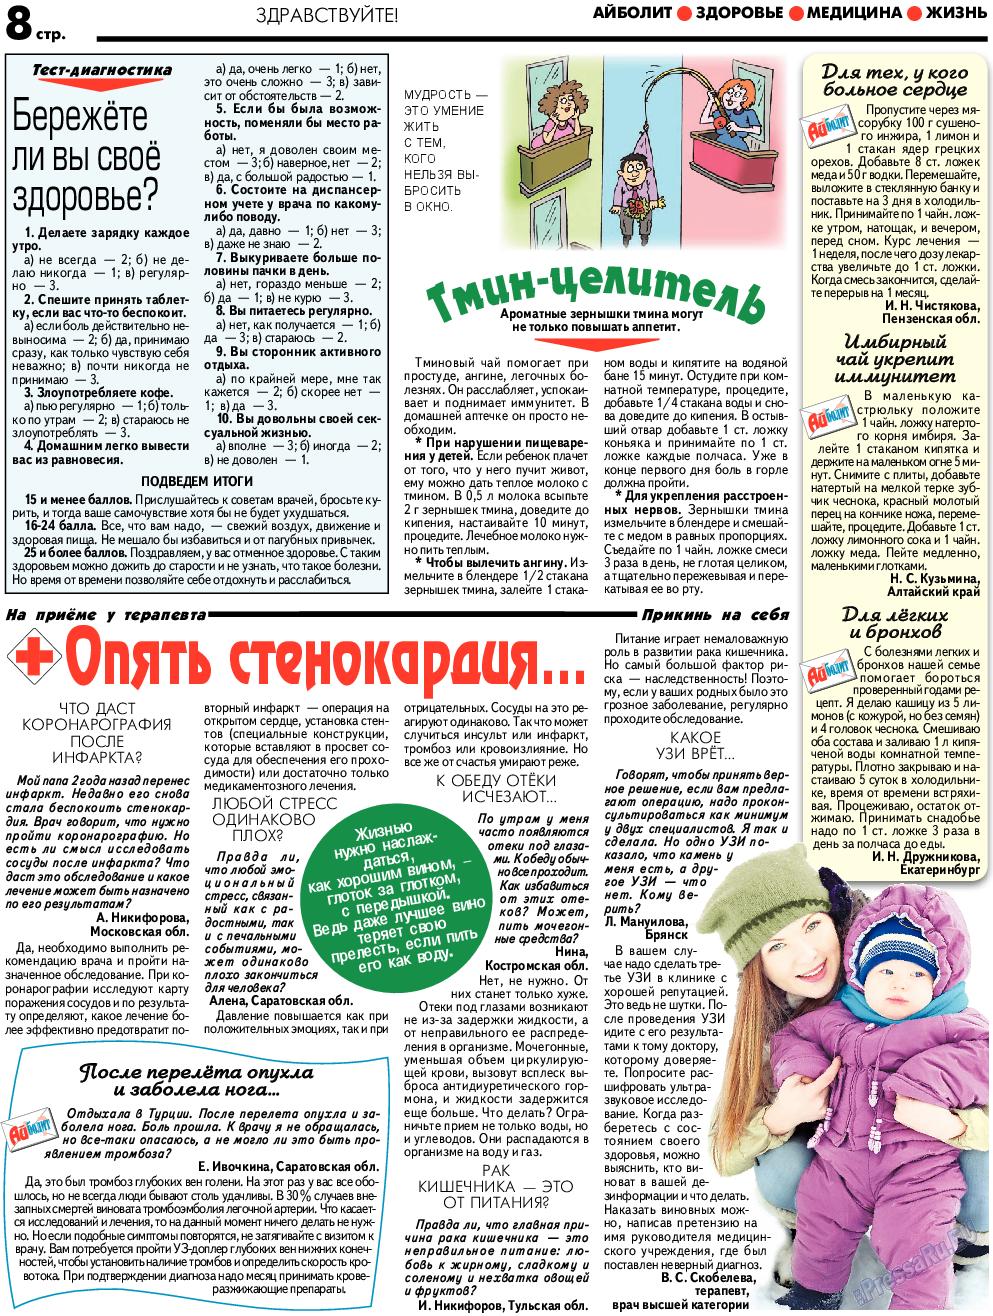 АйБолит (газета). 2018 год, номер 2, стр. 8